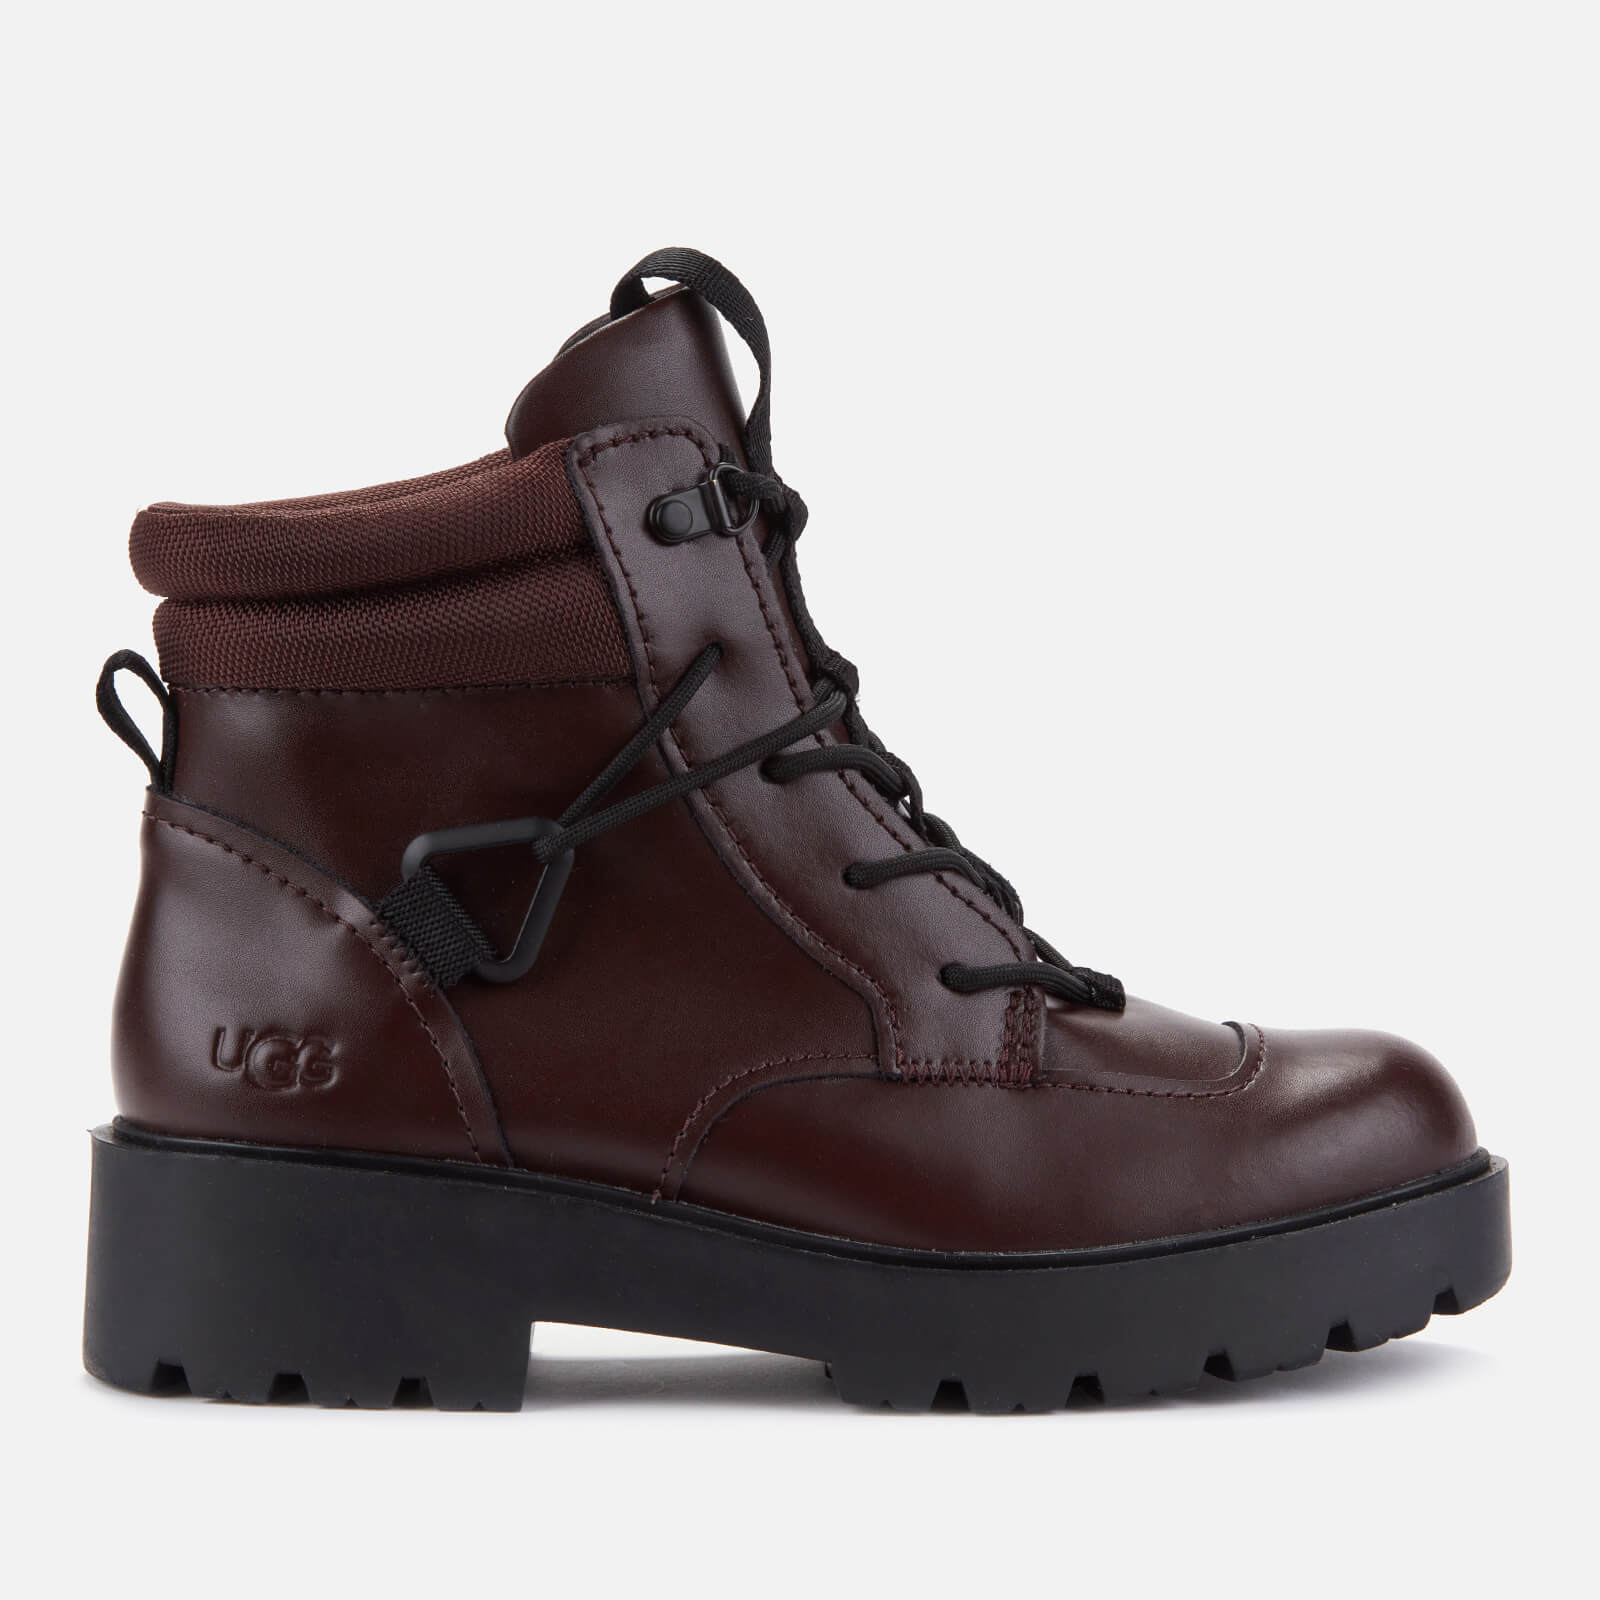 Ugg Women's Tioga Waterproof Leather Hiking Style Boots - Burgundy - Uk 3